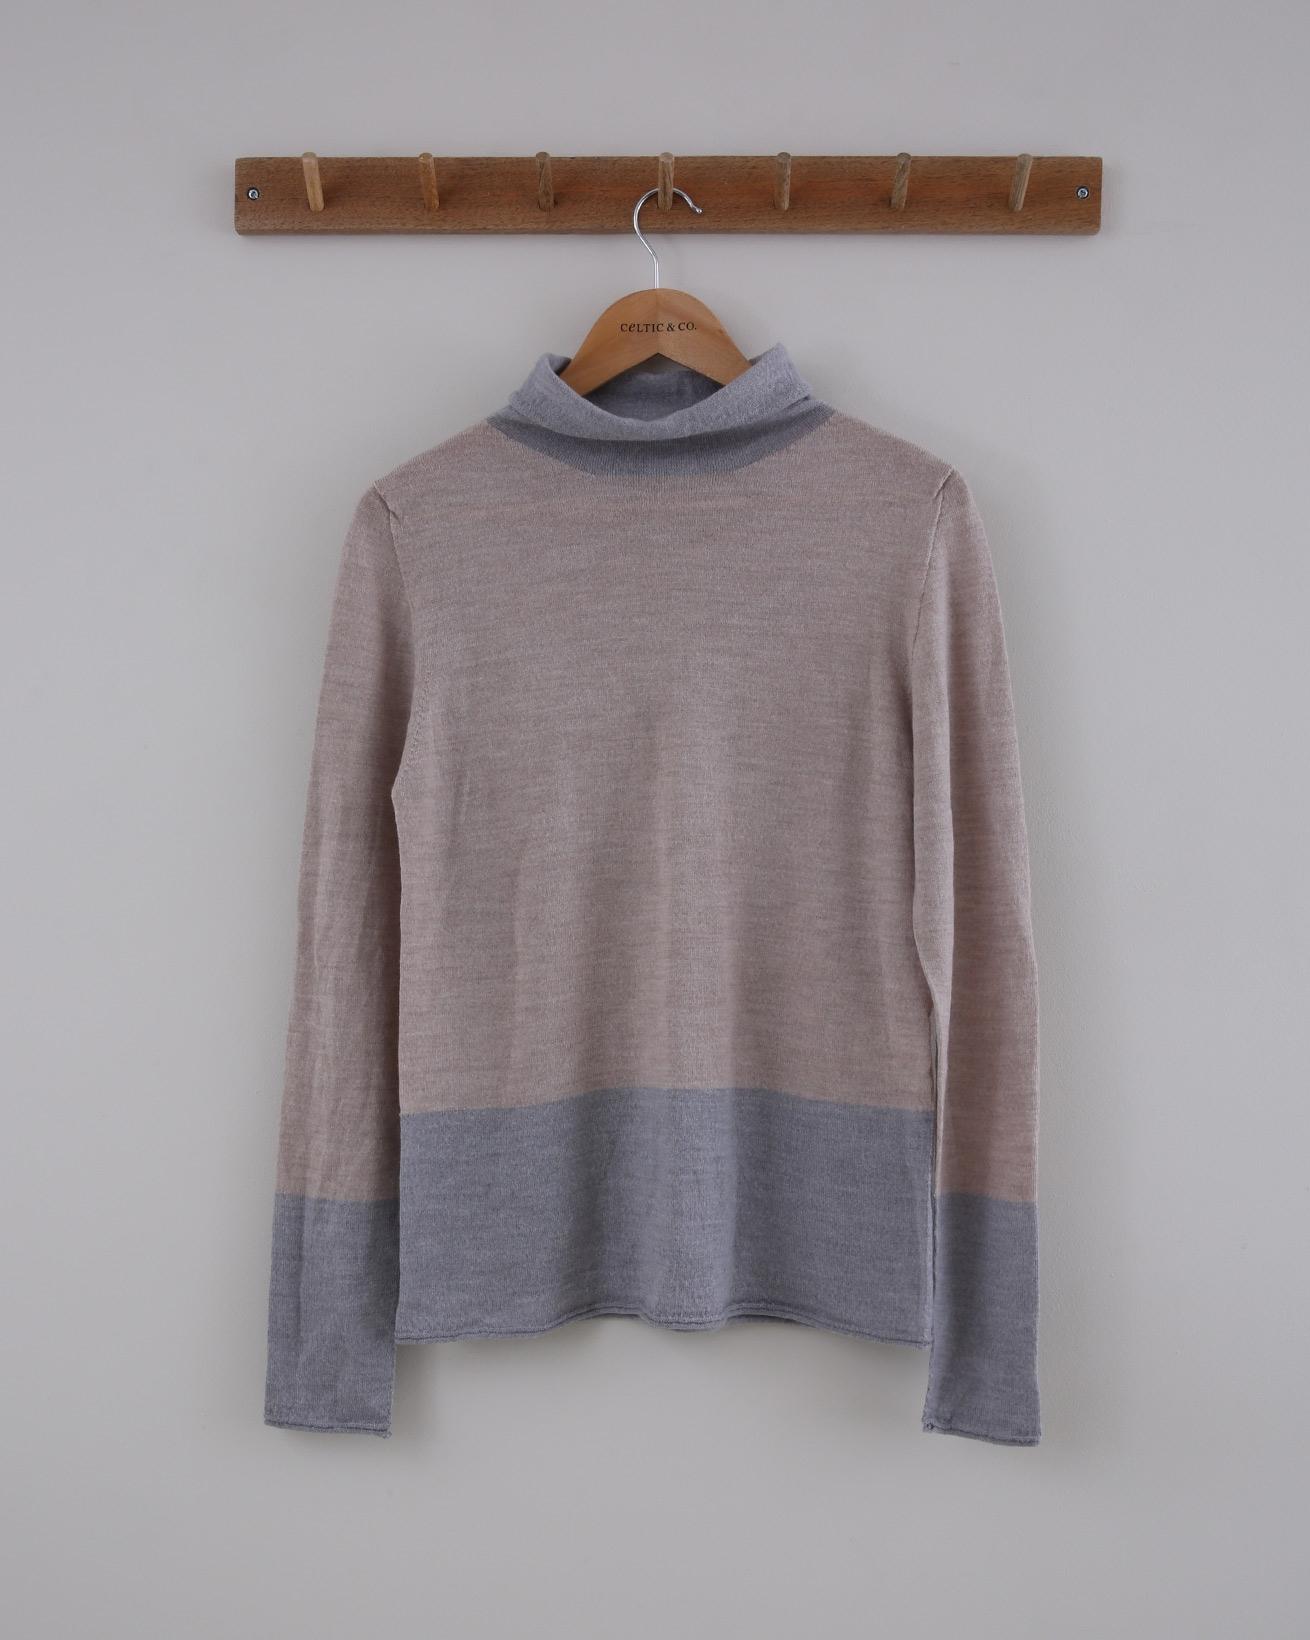 Merino Roll Neck - Size Small - Grey / Blush - 1517